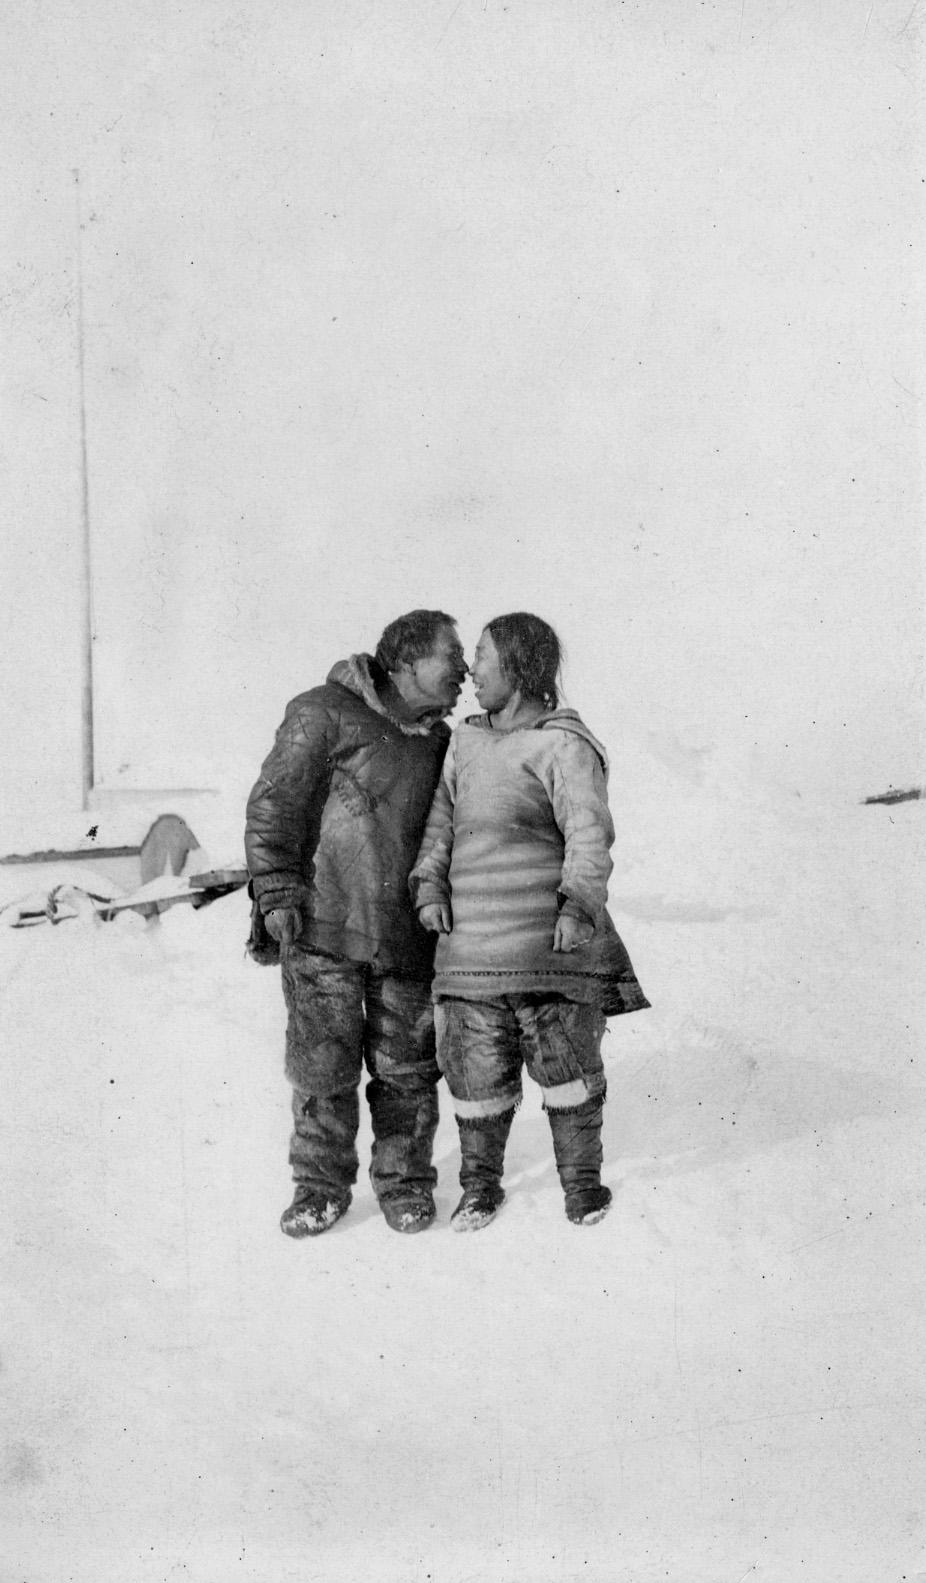 Hudson's Bay Company archive photo, Canadian Arctic